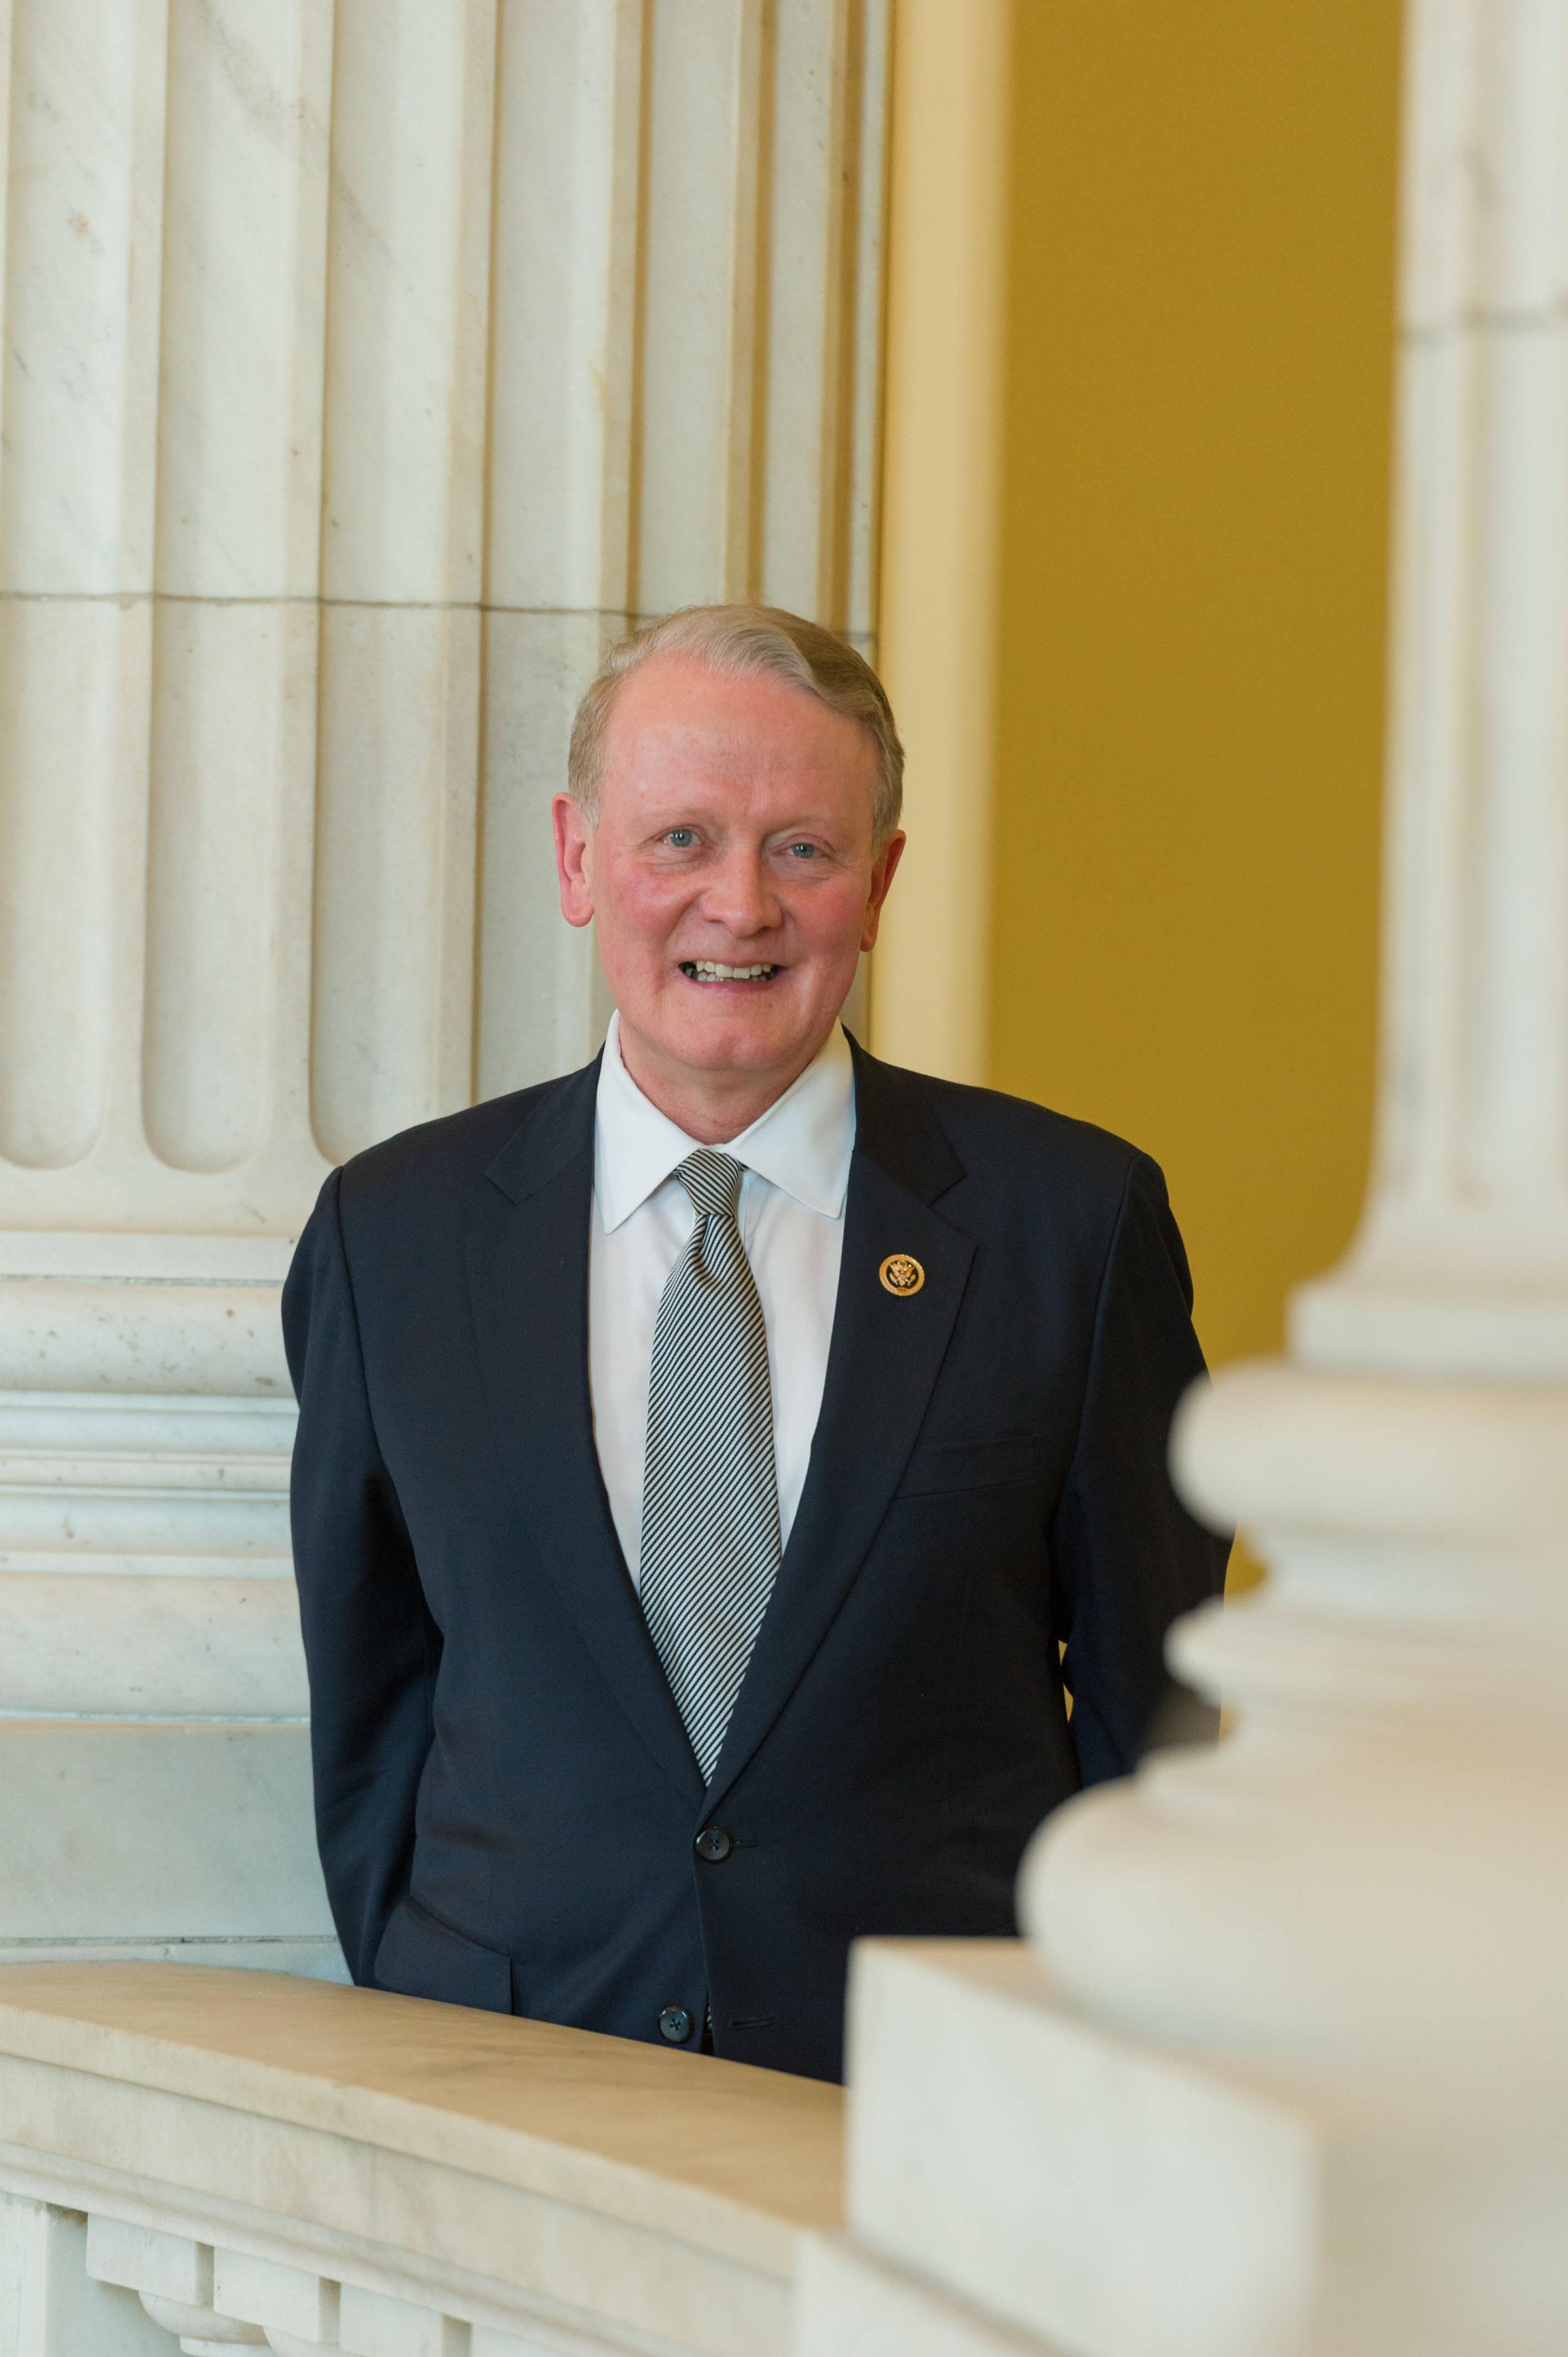 597011ce93148830ec3f_Congressman-Leonard-Lance_official-portrait.jpg